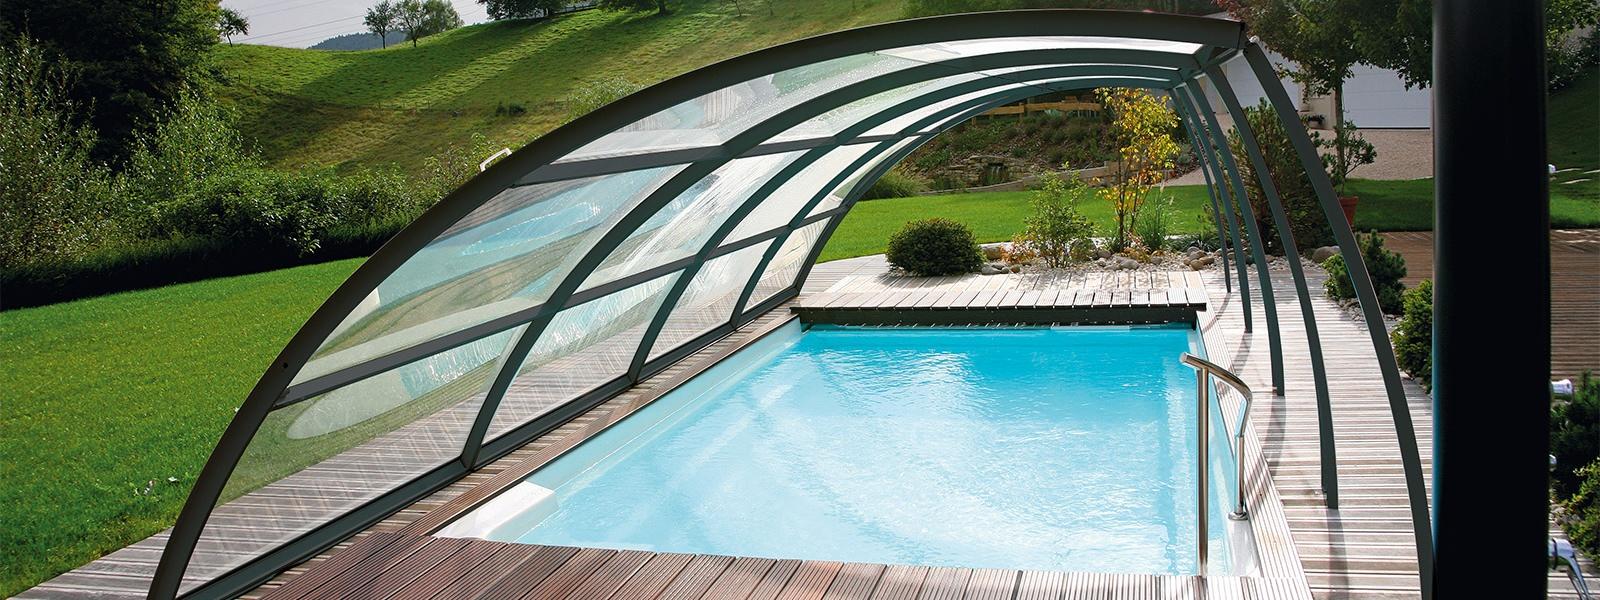 abrisud pool cover at jujuju aquacenter benissa calpe moraira altea javea denia benidorm